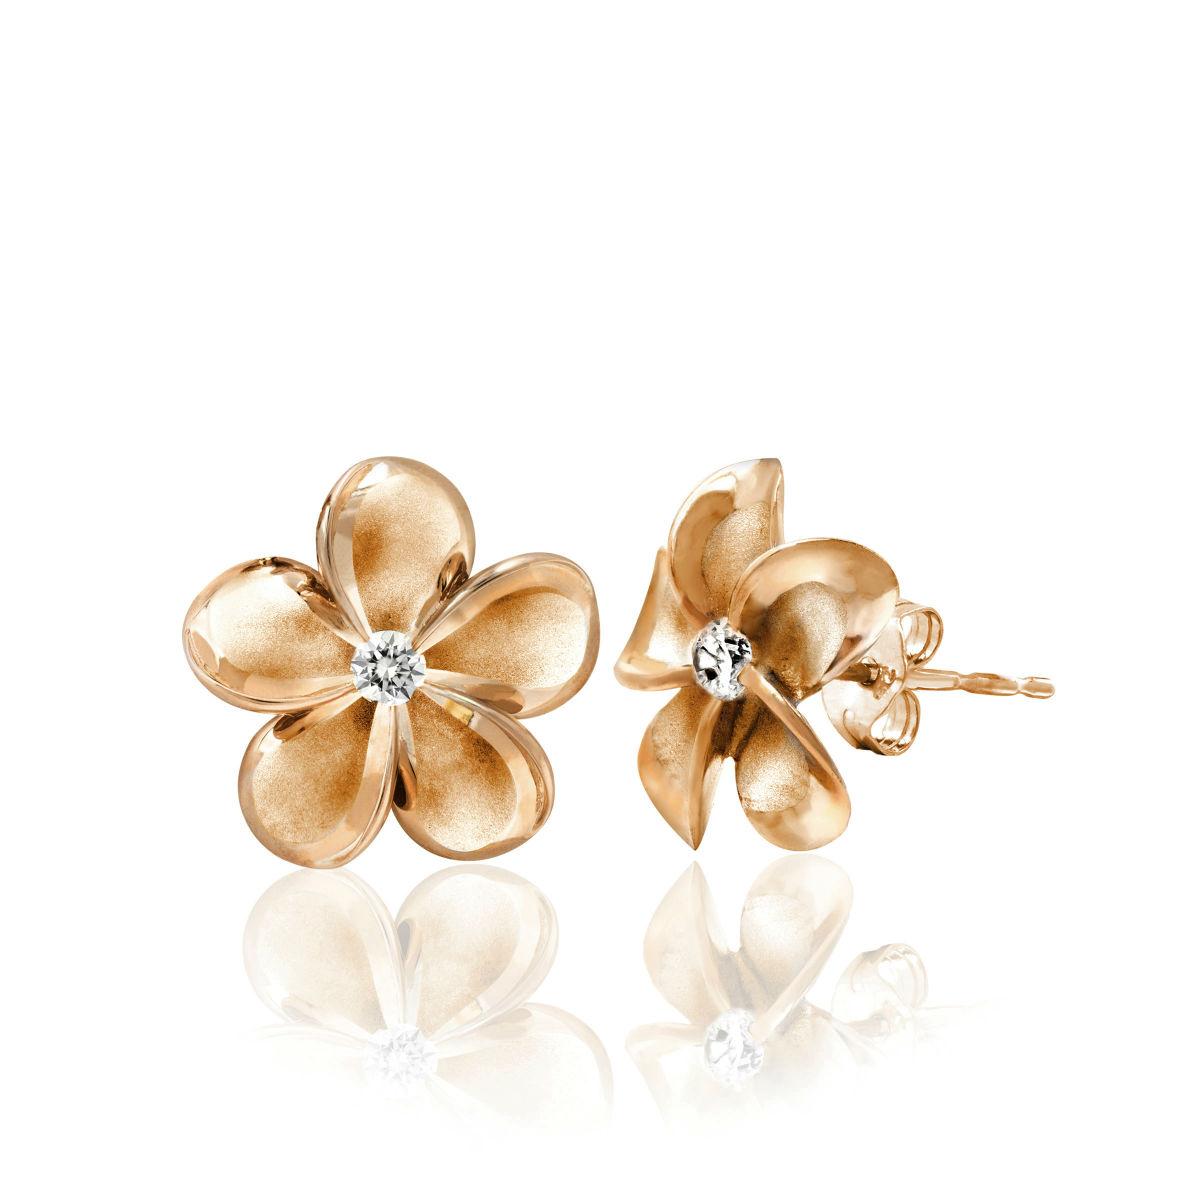 Queen Plumeria Diamond Stud Earrings 14K Rose Gold